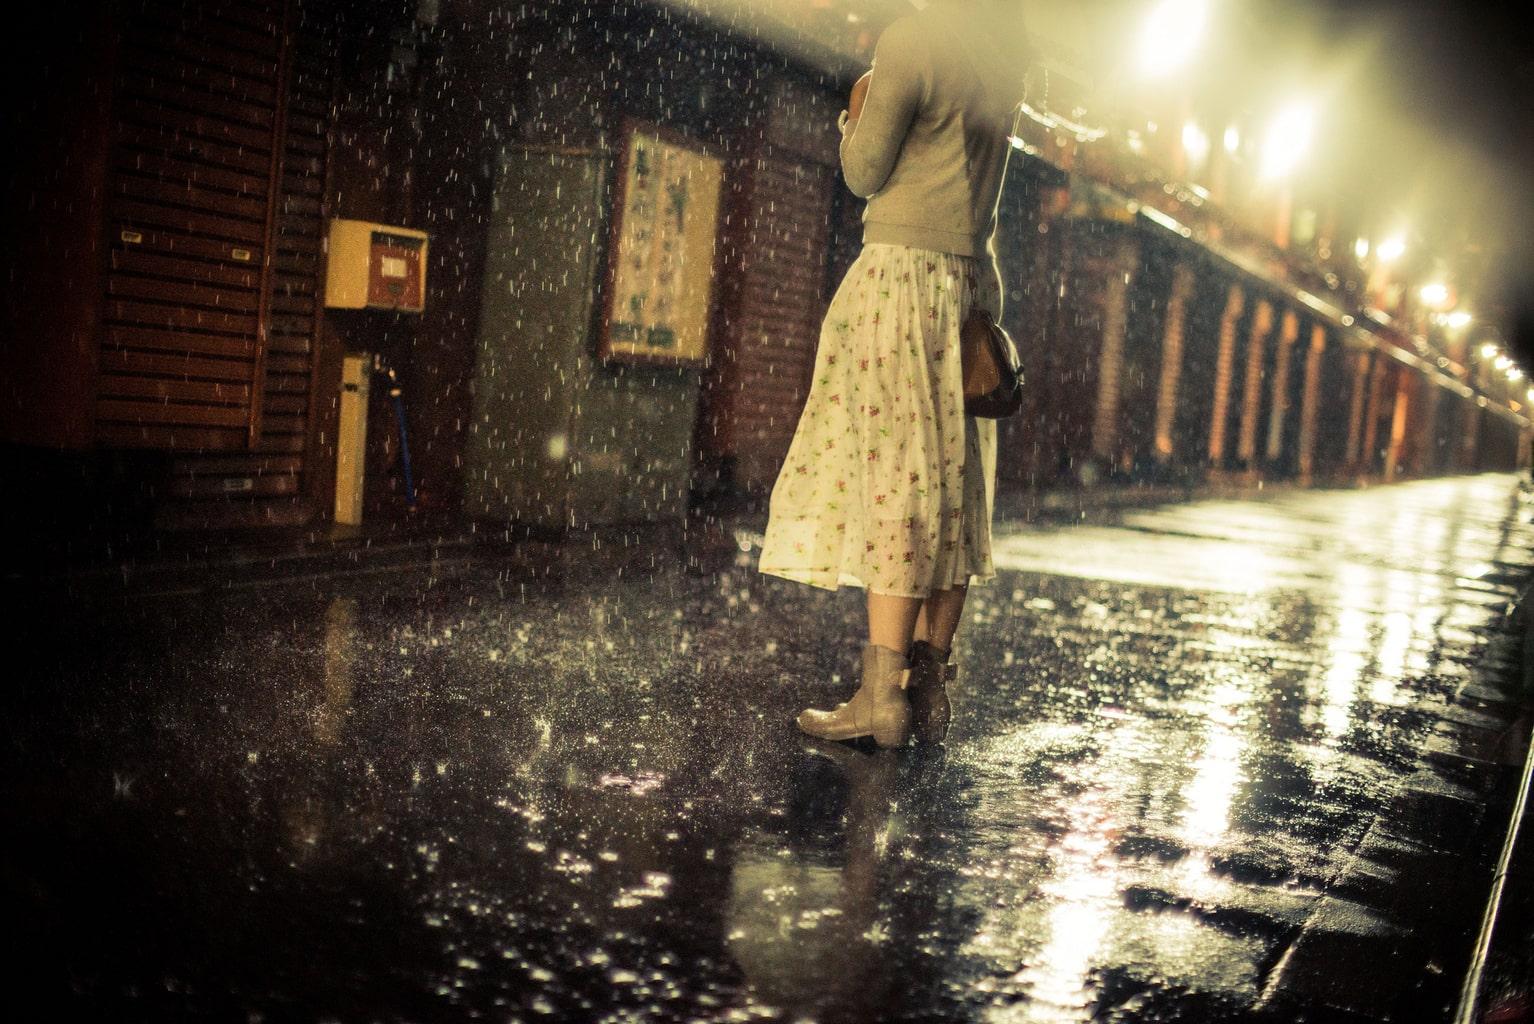 La lluvia nostálgica